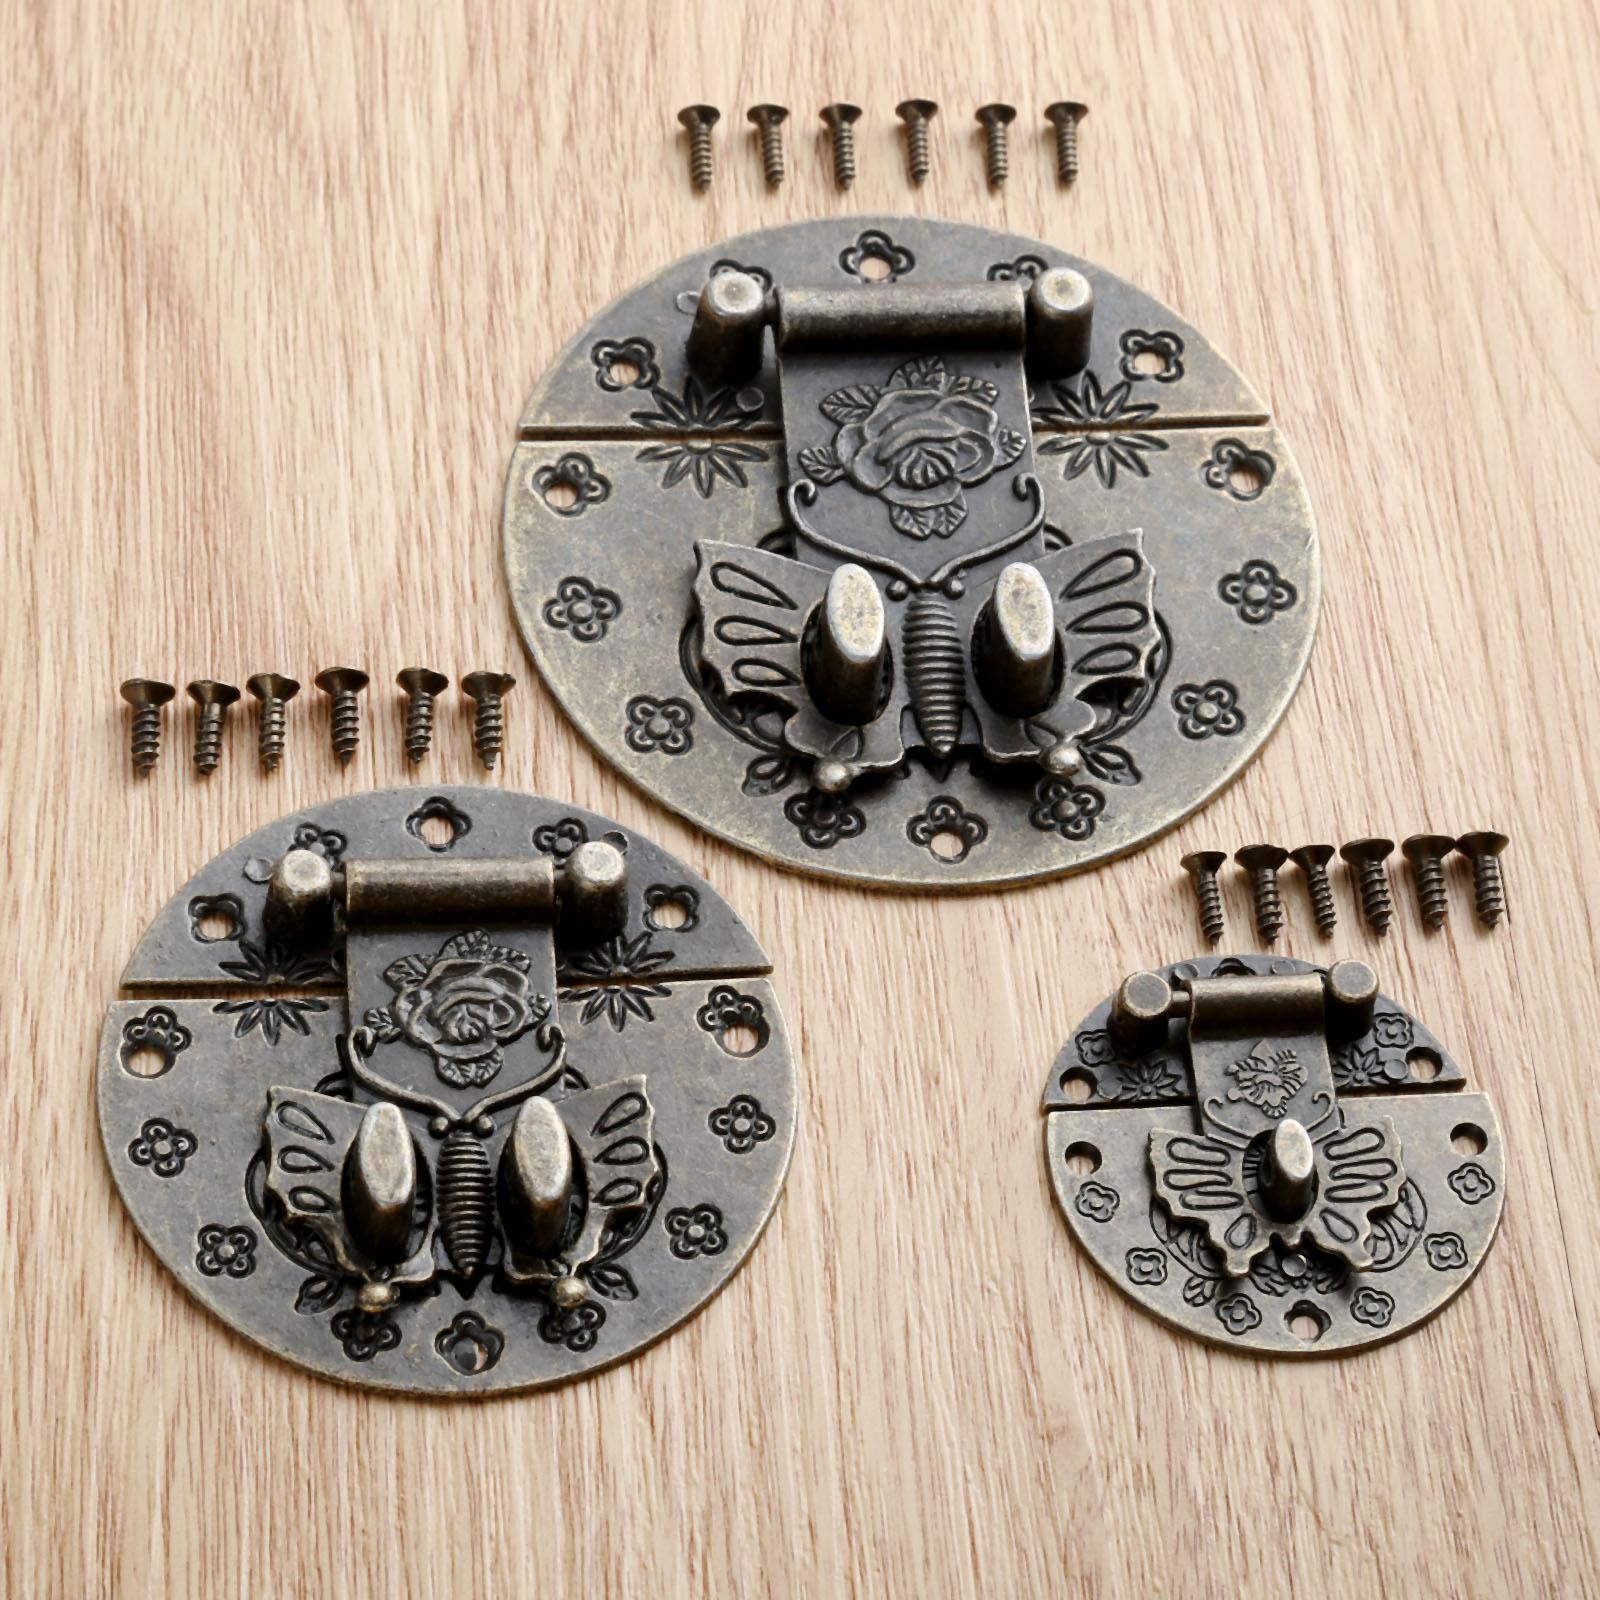 DRELD 1Pc Vintage Butterfly Clasp Alloy Buckles Wooden Jewelry Box Buckles Wine Box Flower Lock Buckle Decor Hardware 38/59/74mm